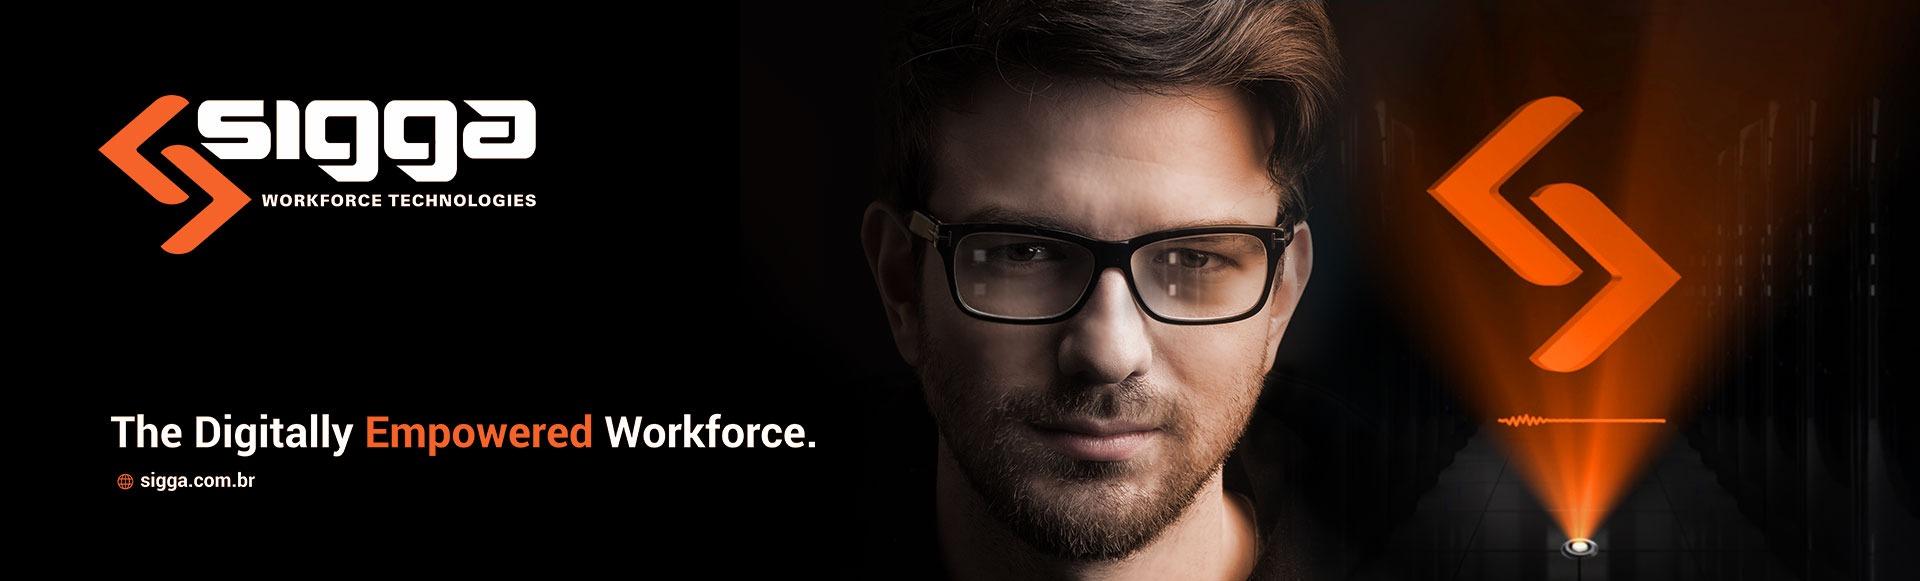 Sigga - Workforce Technologies